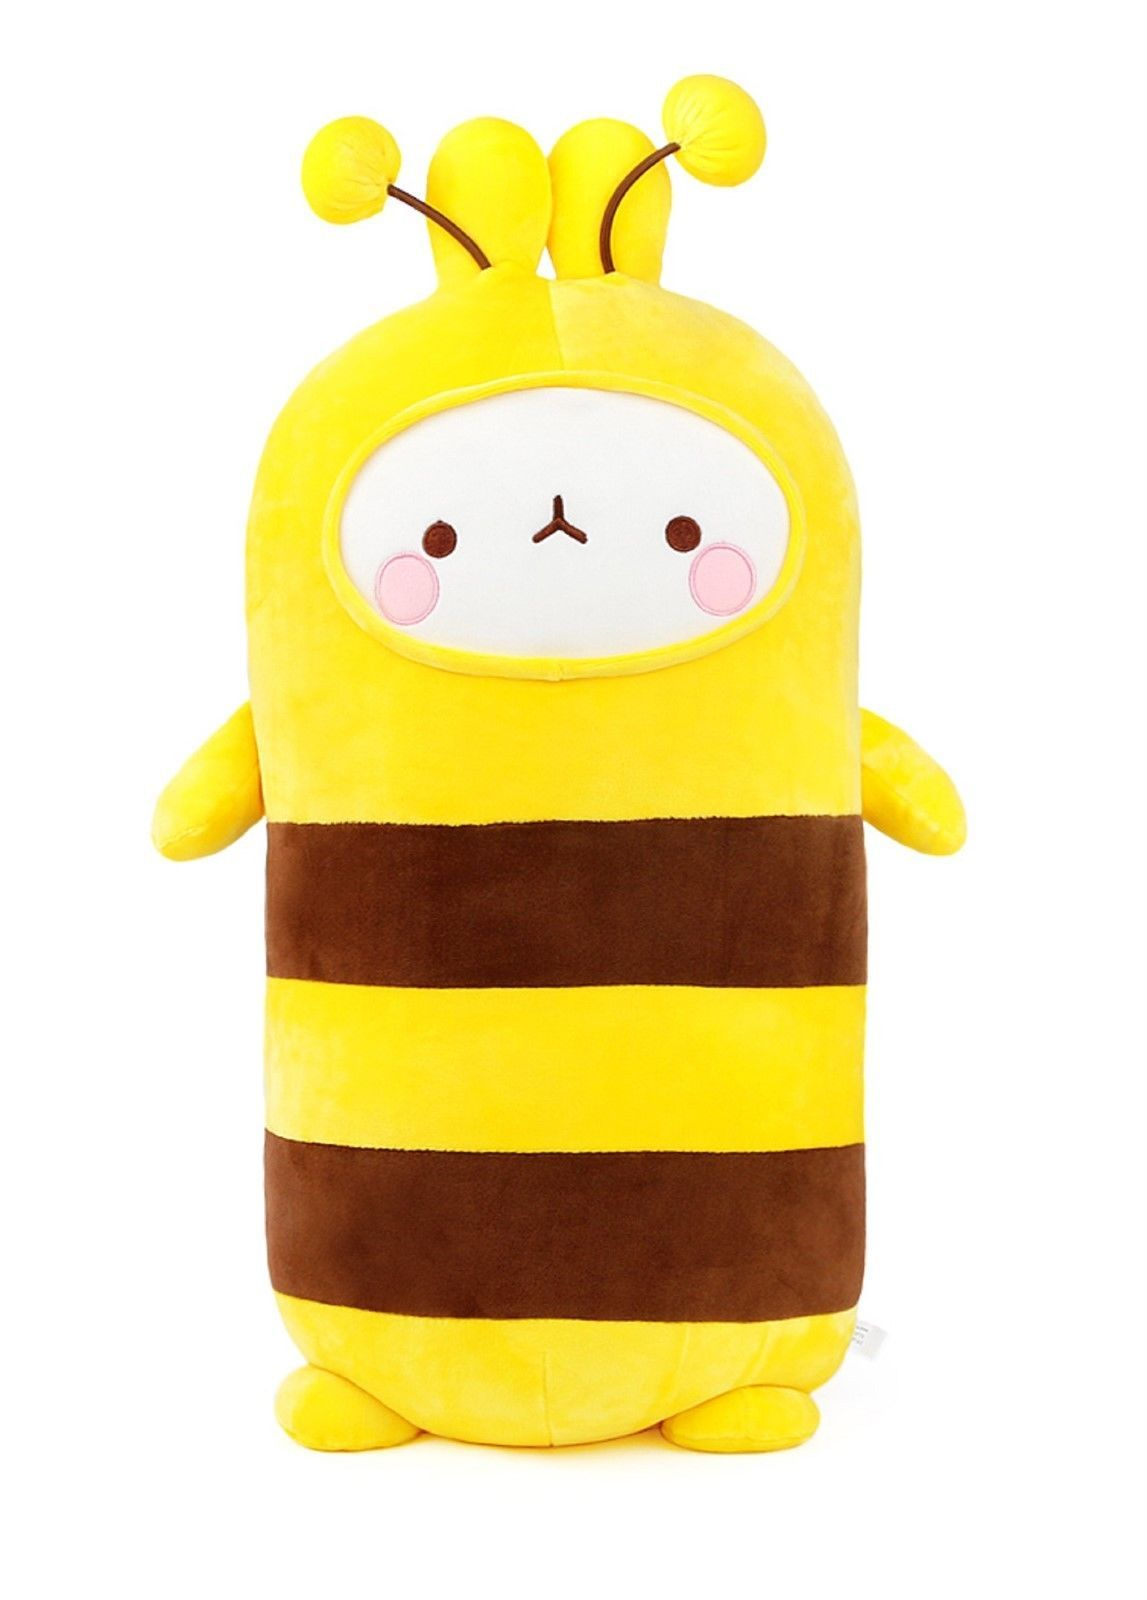 Seyoung Fluffy Stuffed Cute Honey Bee Figurine Animal Soft Mochi Plush Toy